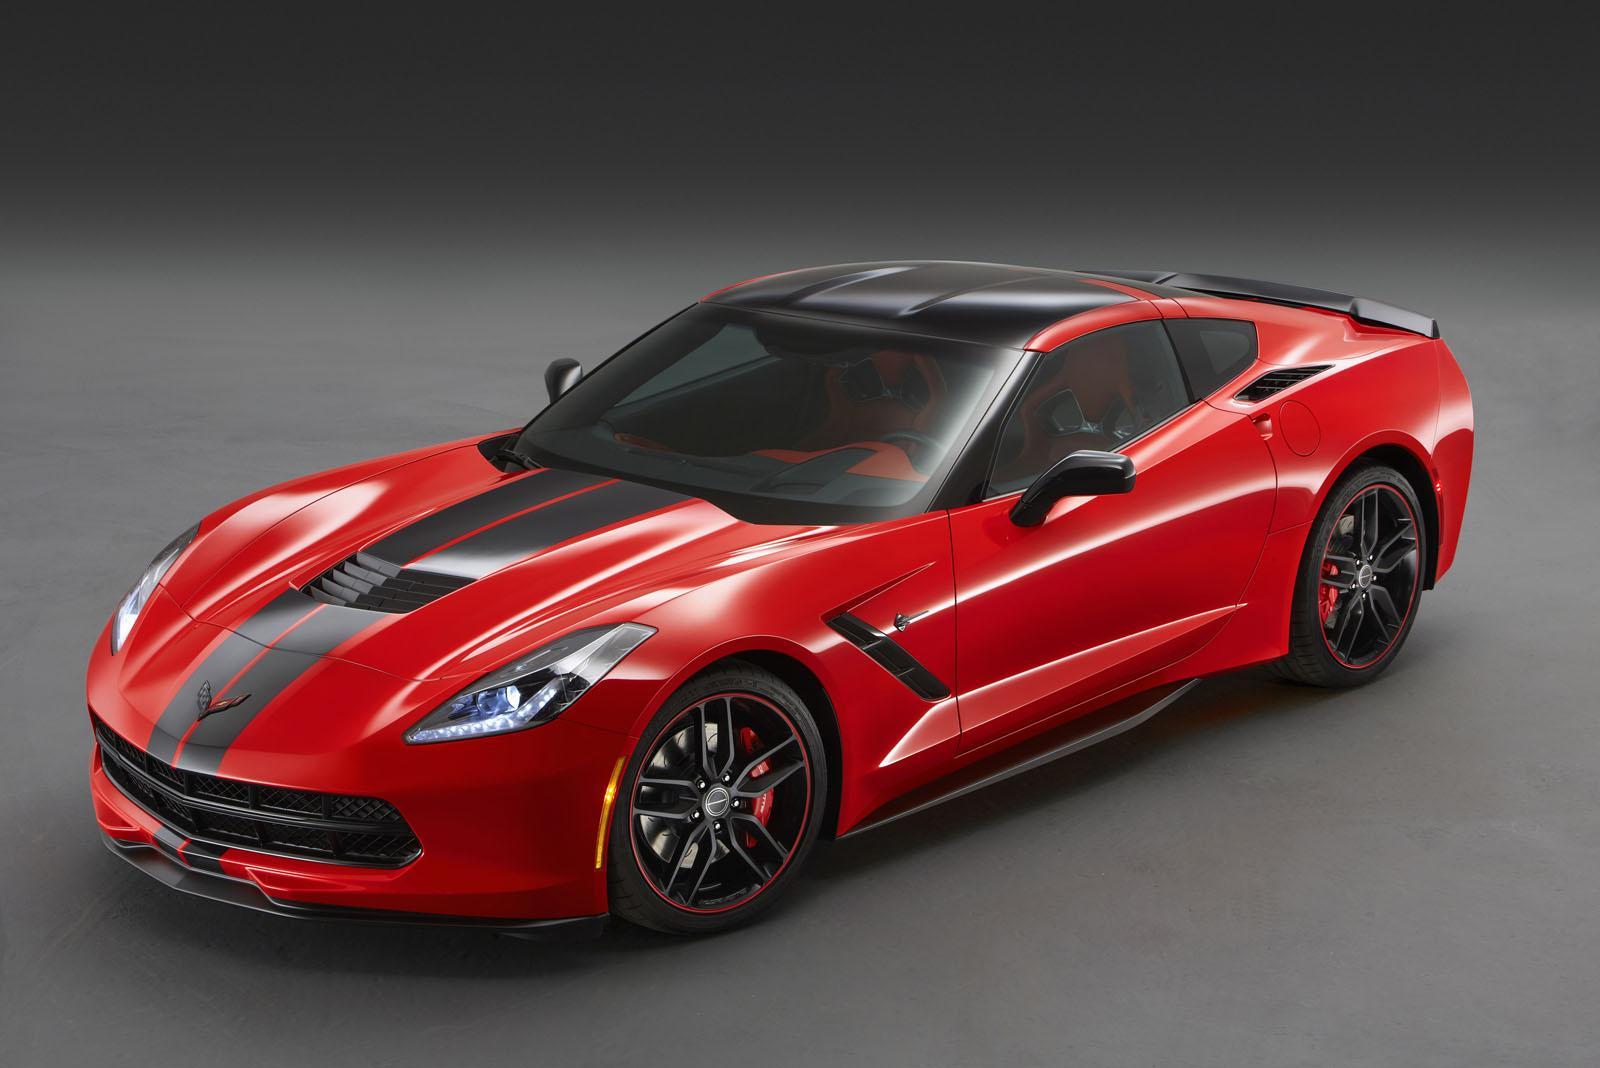 Chevrolet Corvette Reviews - Chevrolet Corvette Price, Photos, and ...